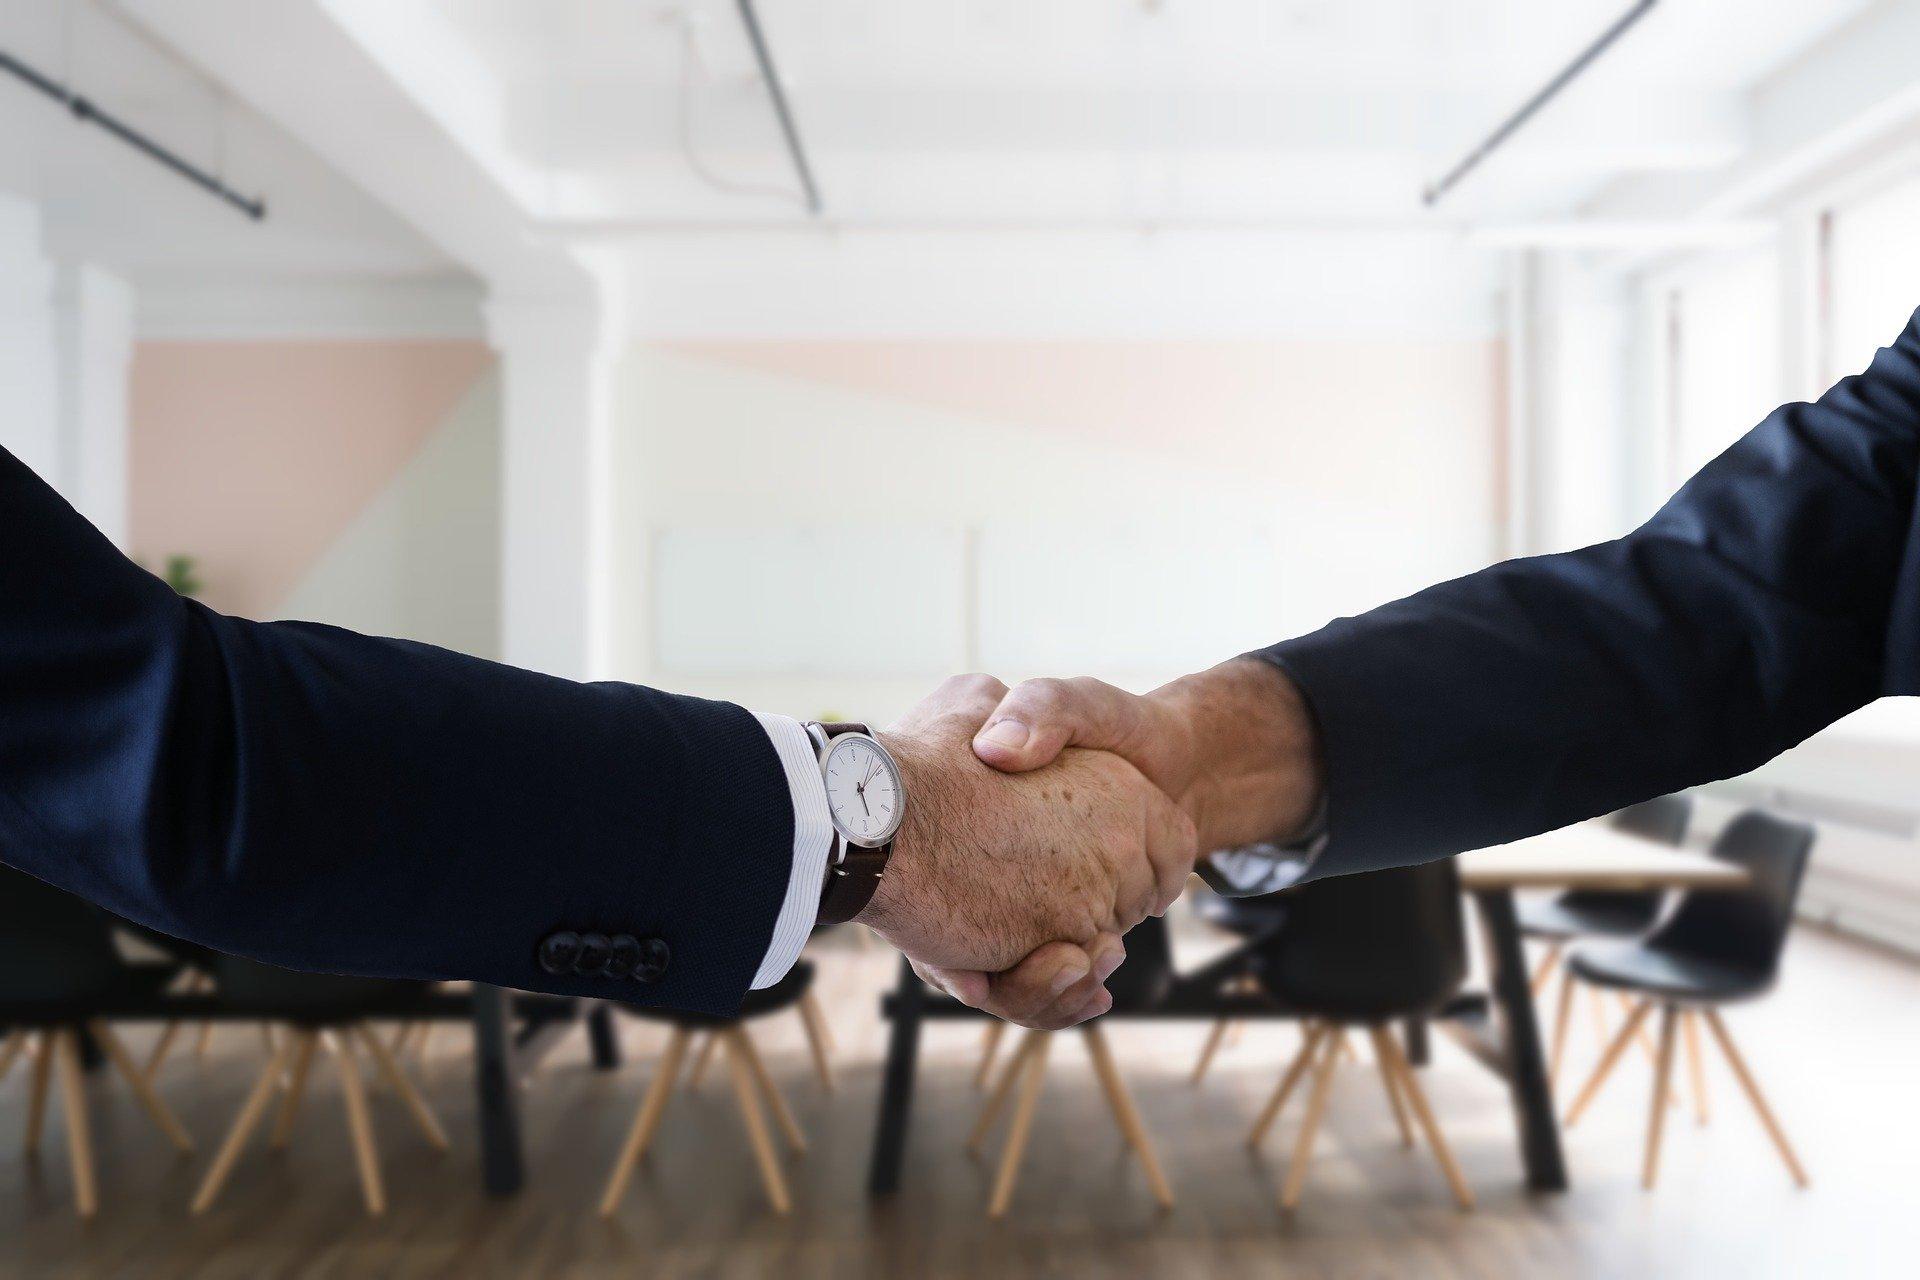 Nestlé to acquire core brands of The Bountiful Company